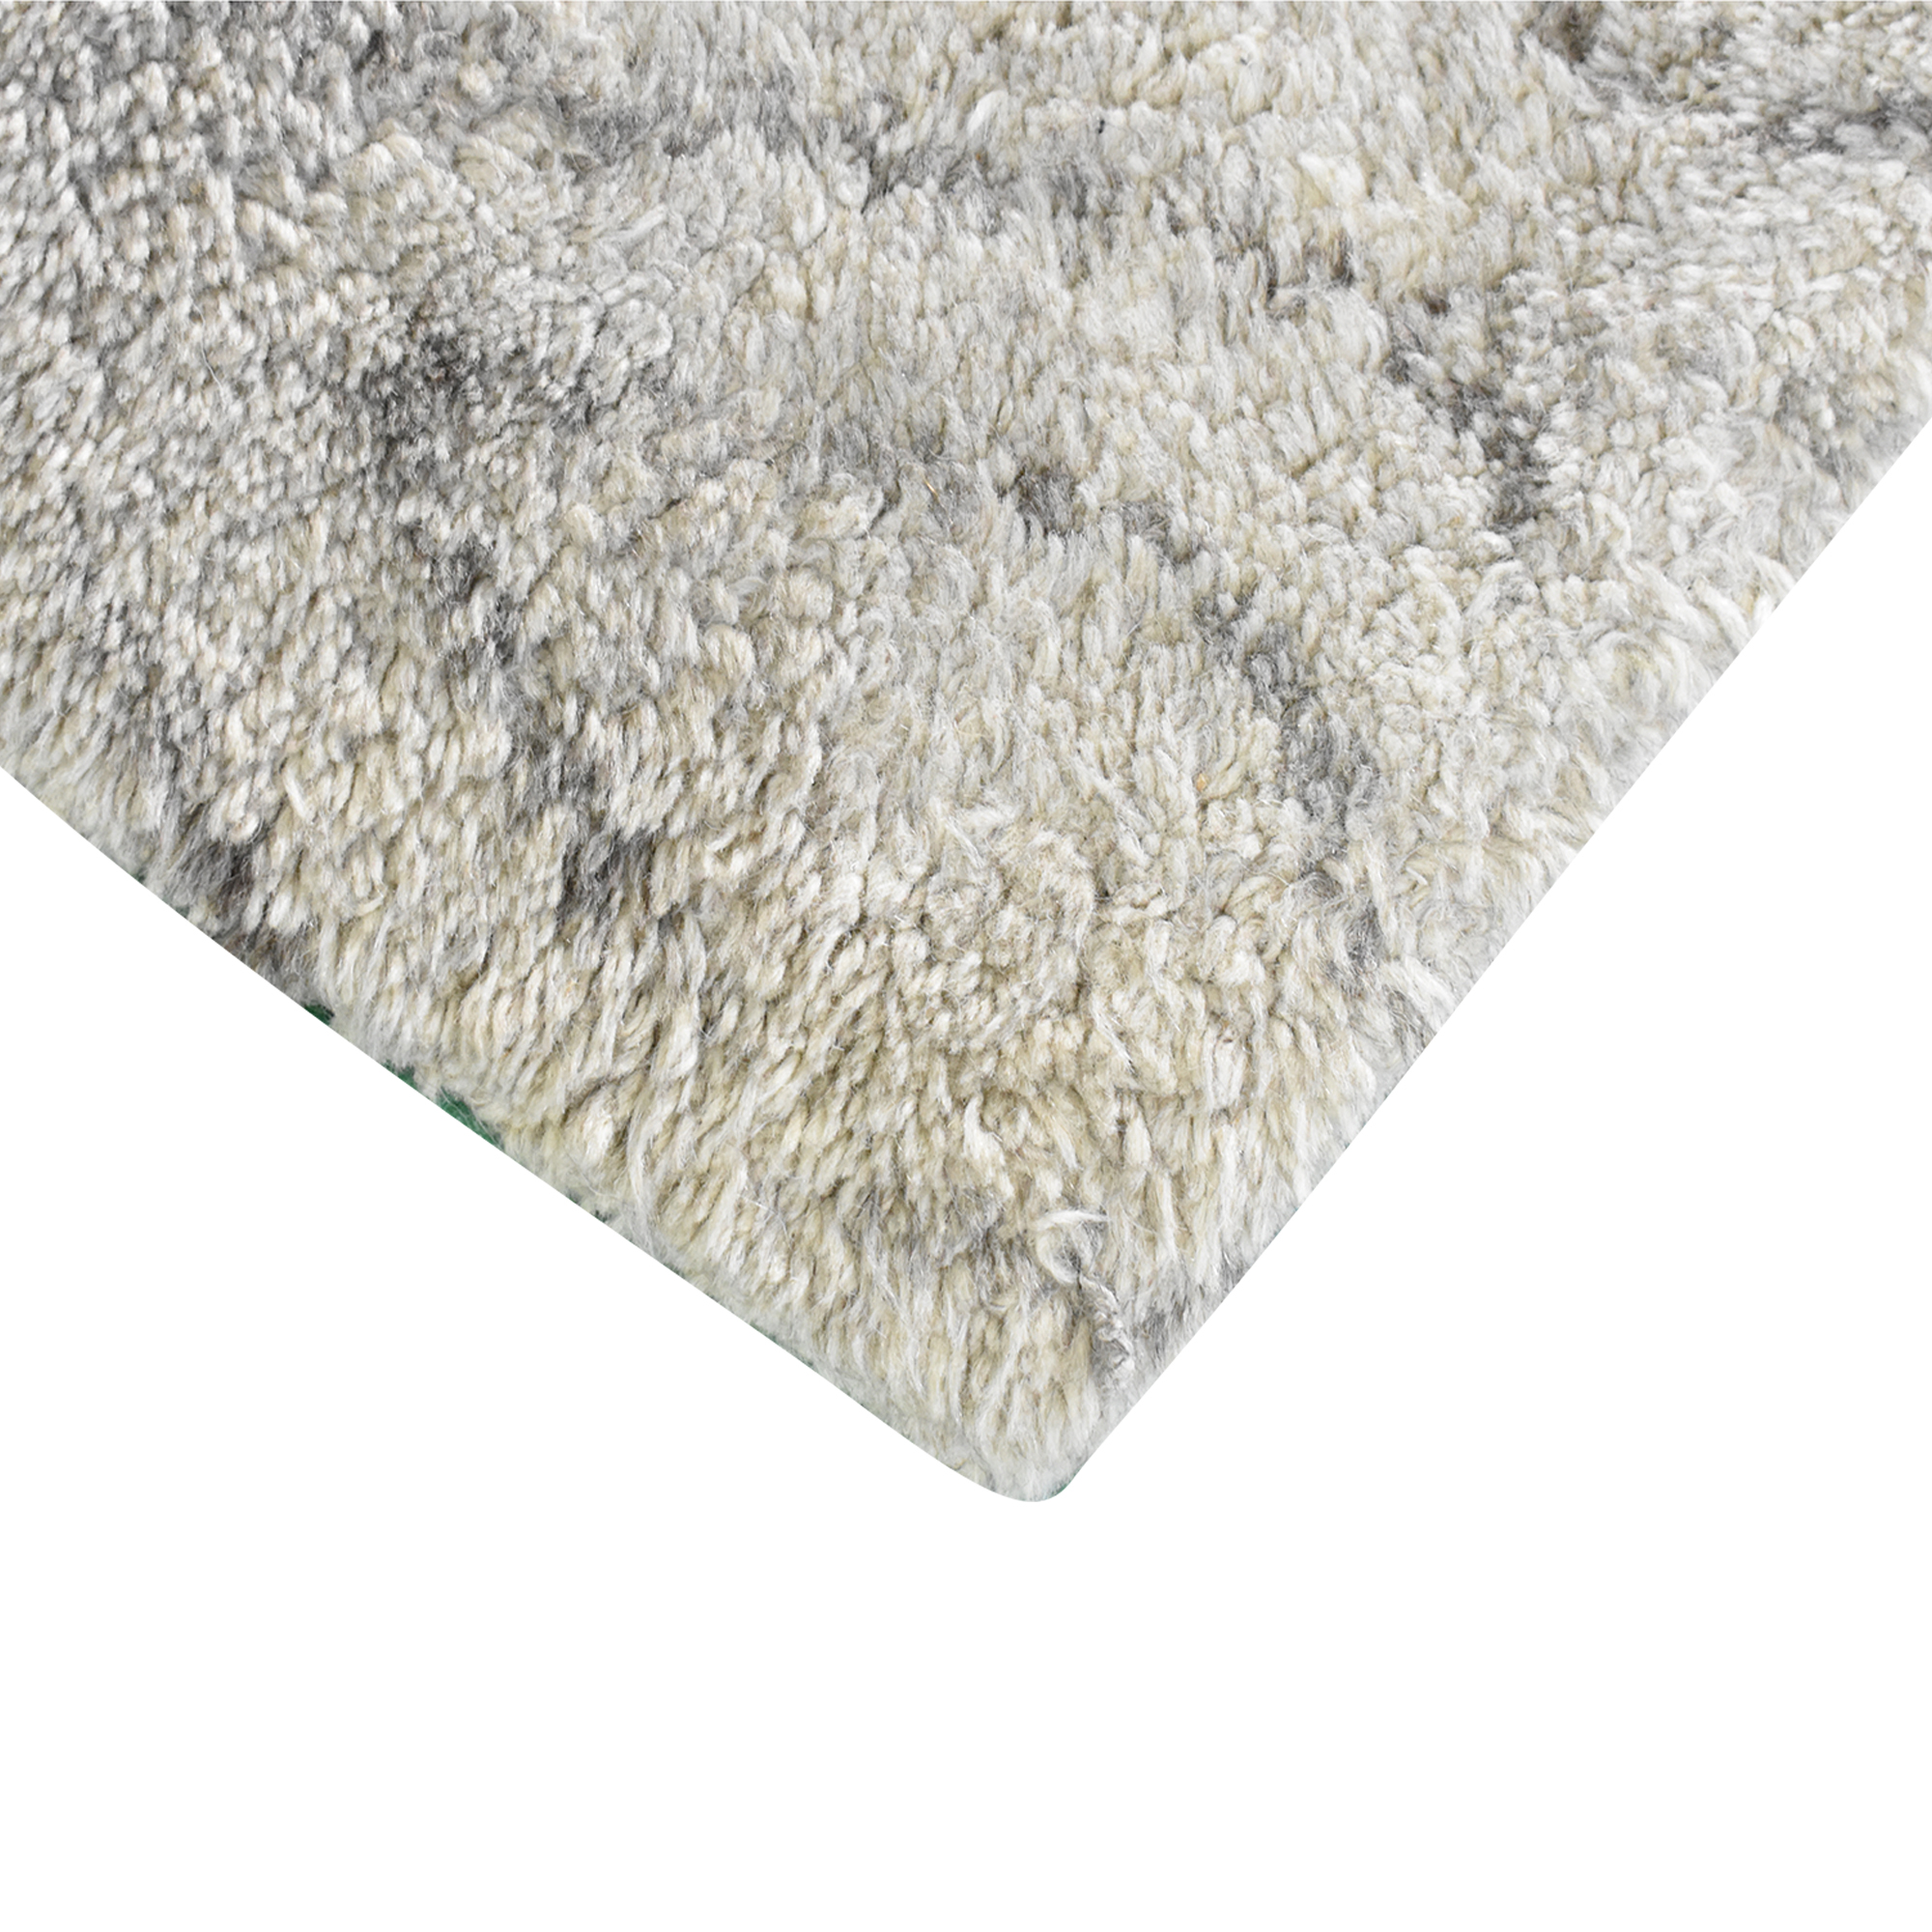 Dash & Albert Dash & Albert Massinissa Area Rug beige and gray